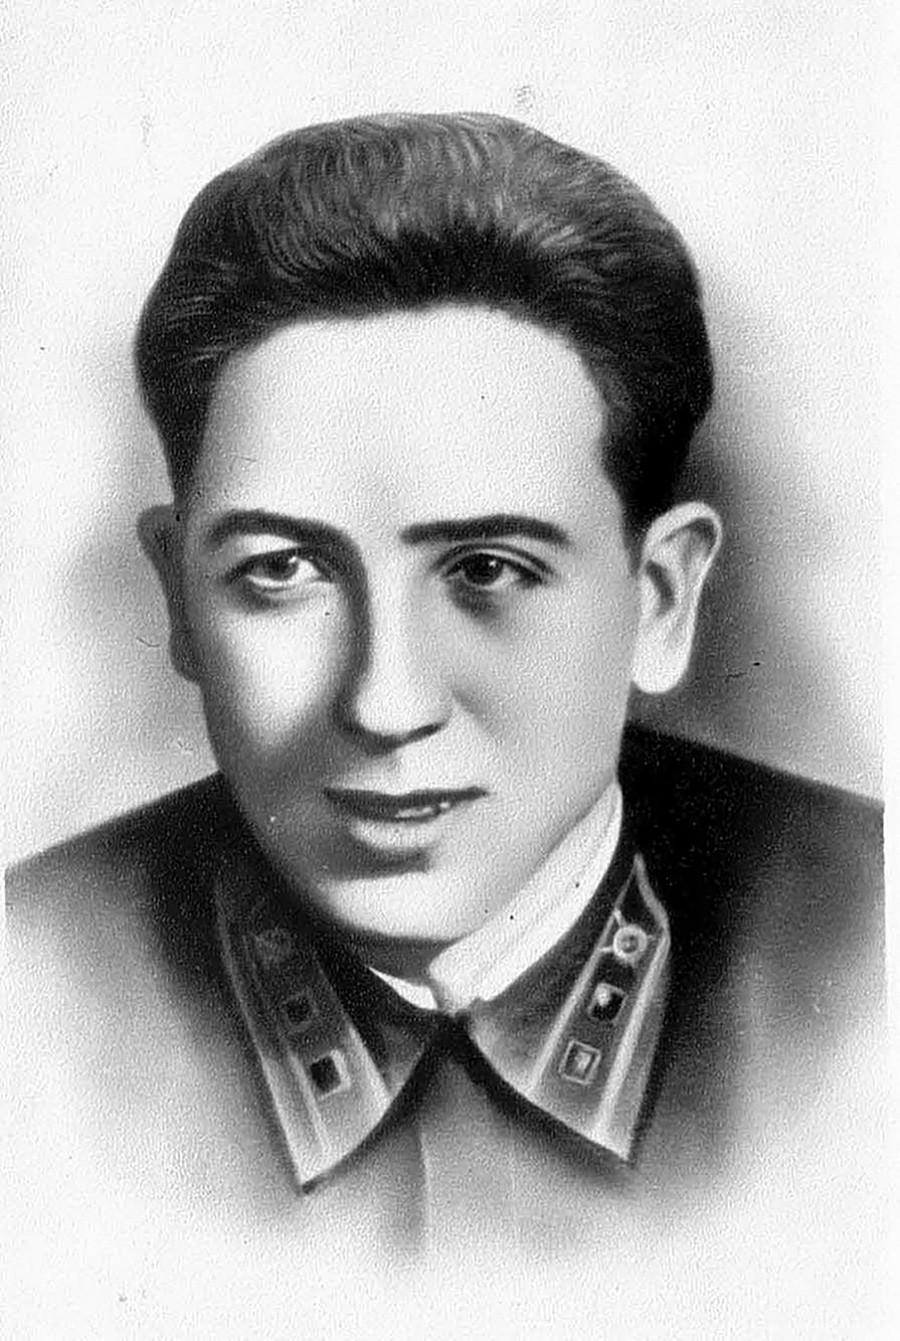 Held der Sowjetunion Ruben Ruiz Ibarruri